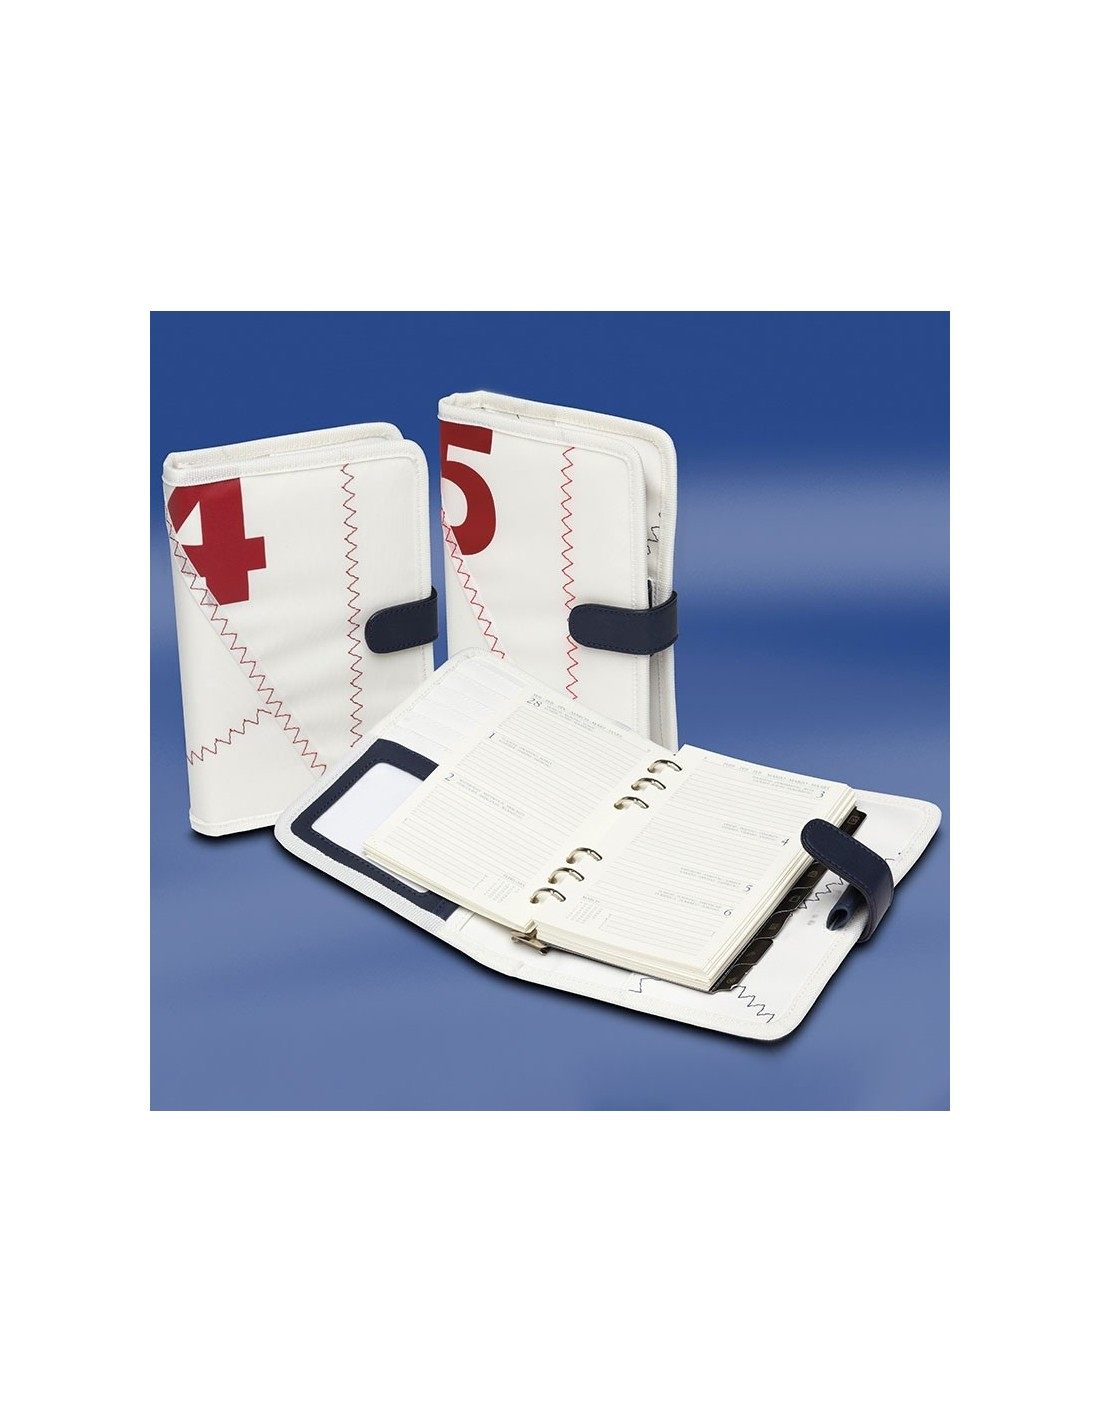 A5 Zeildoek Agenda - Sea Organizer - Rood - Trend Marine - Zeildoek Tassen - TM1050.3